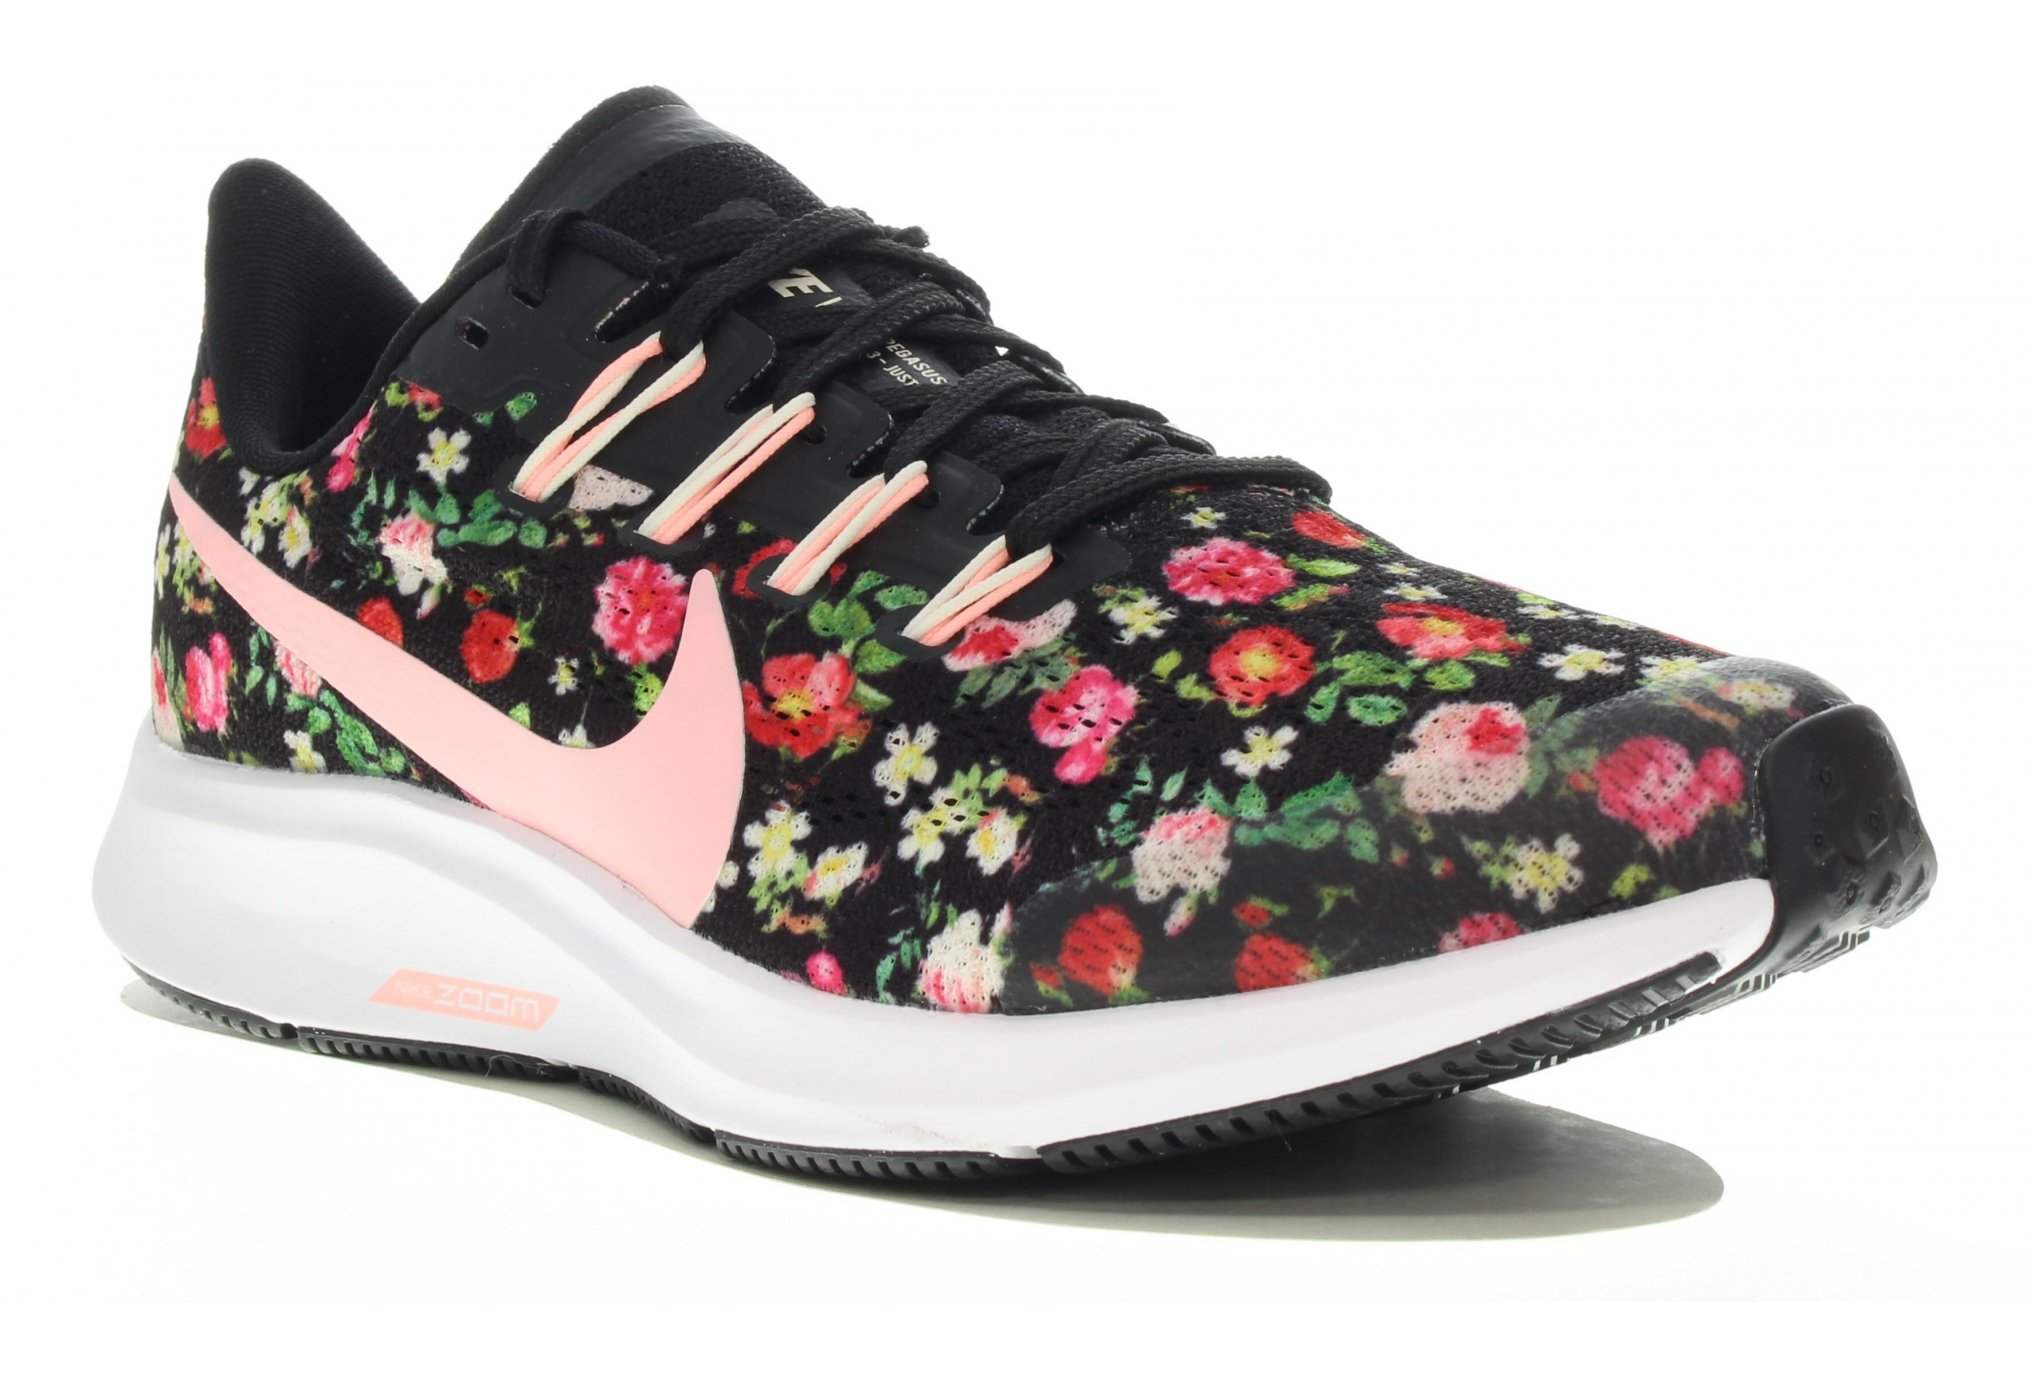 Nike Air Zoom Pegasus 36 Vintage Floral GS Chaussures running femme